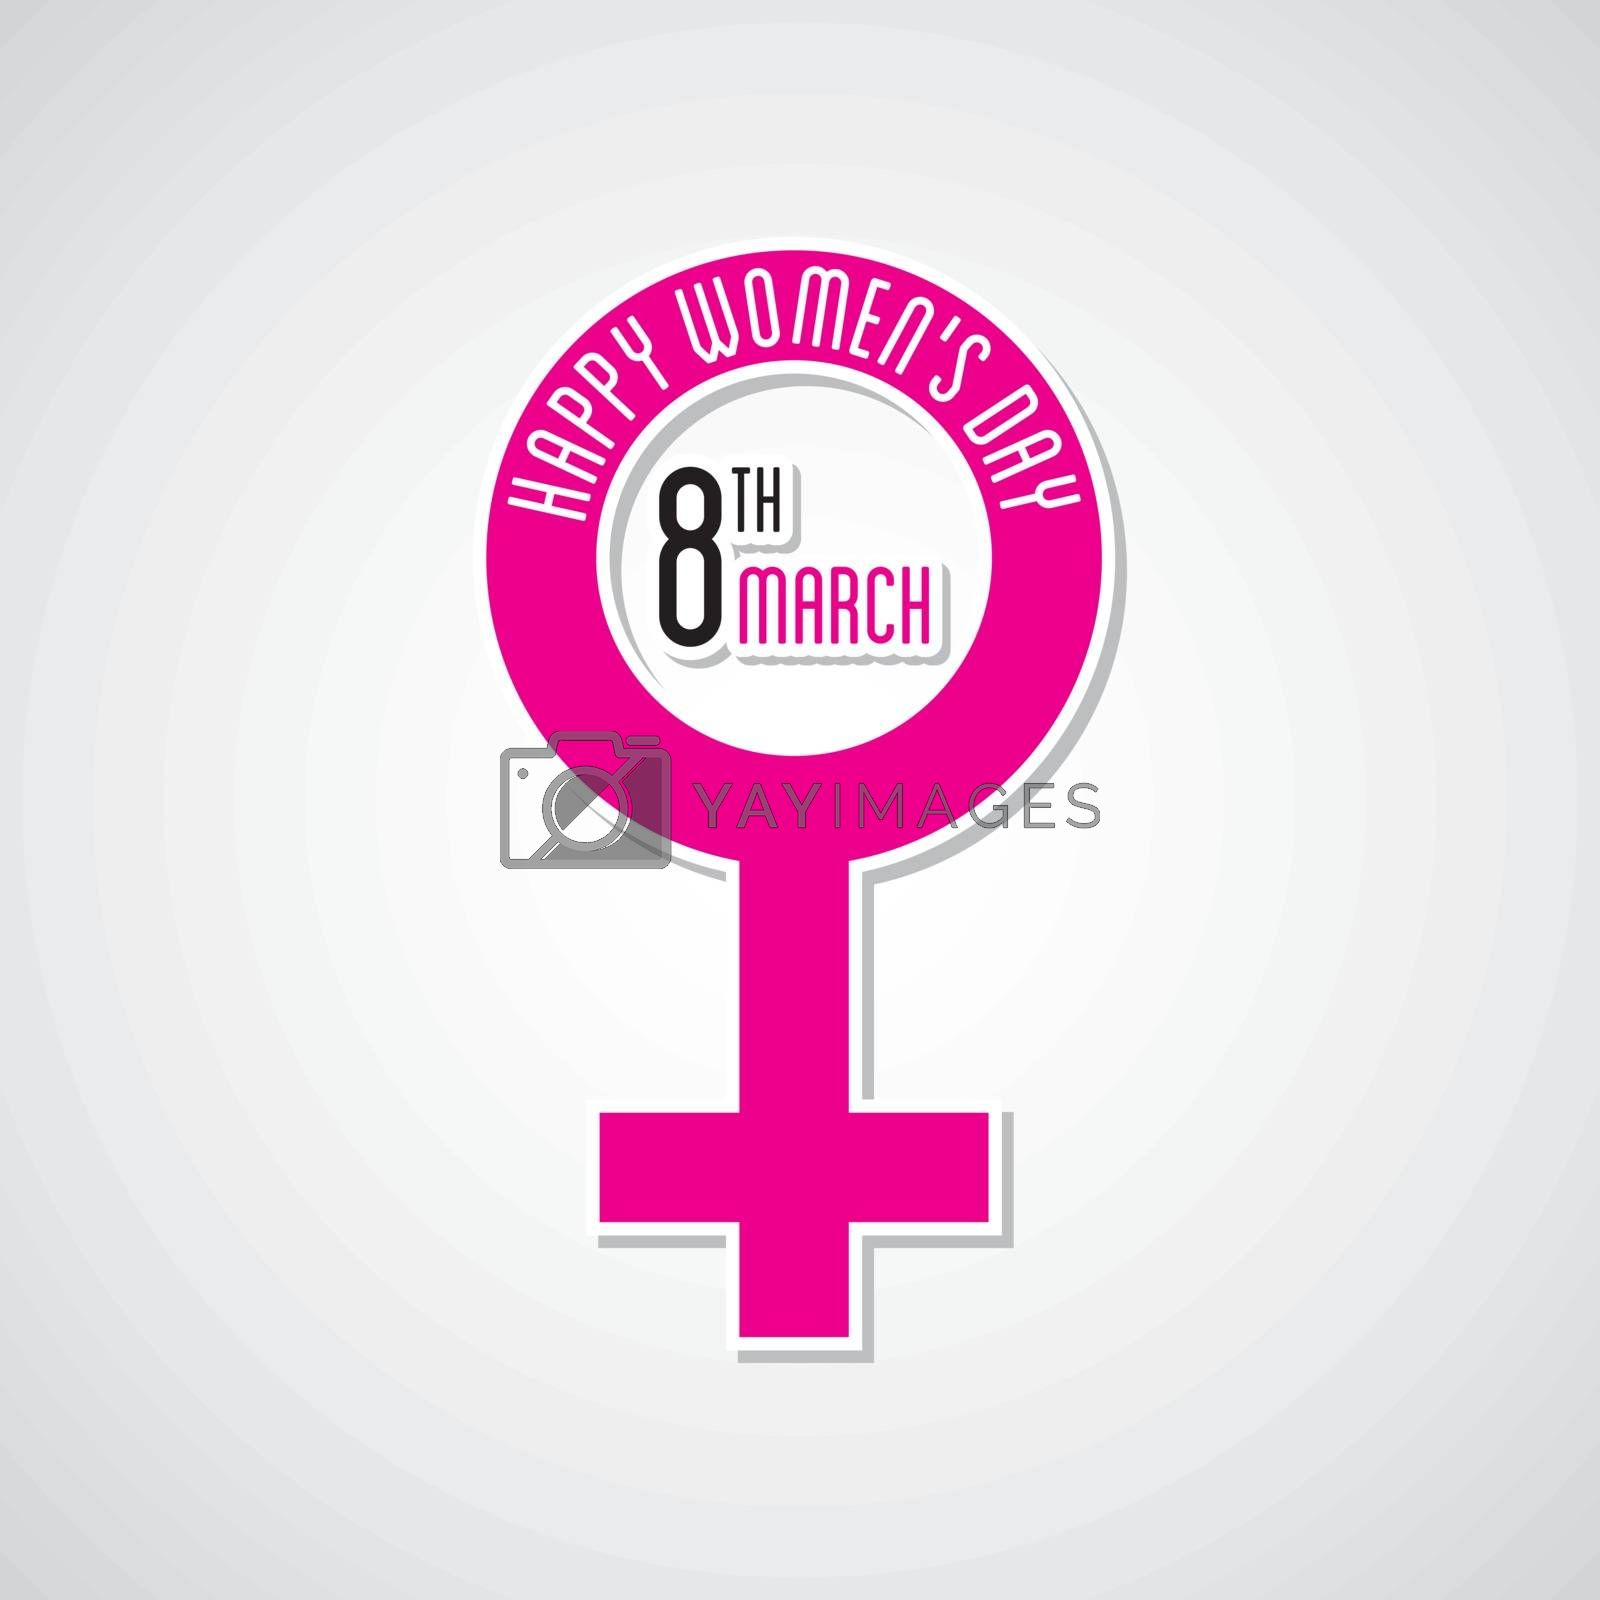 happy womens day greeting design using female symbol